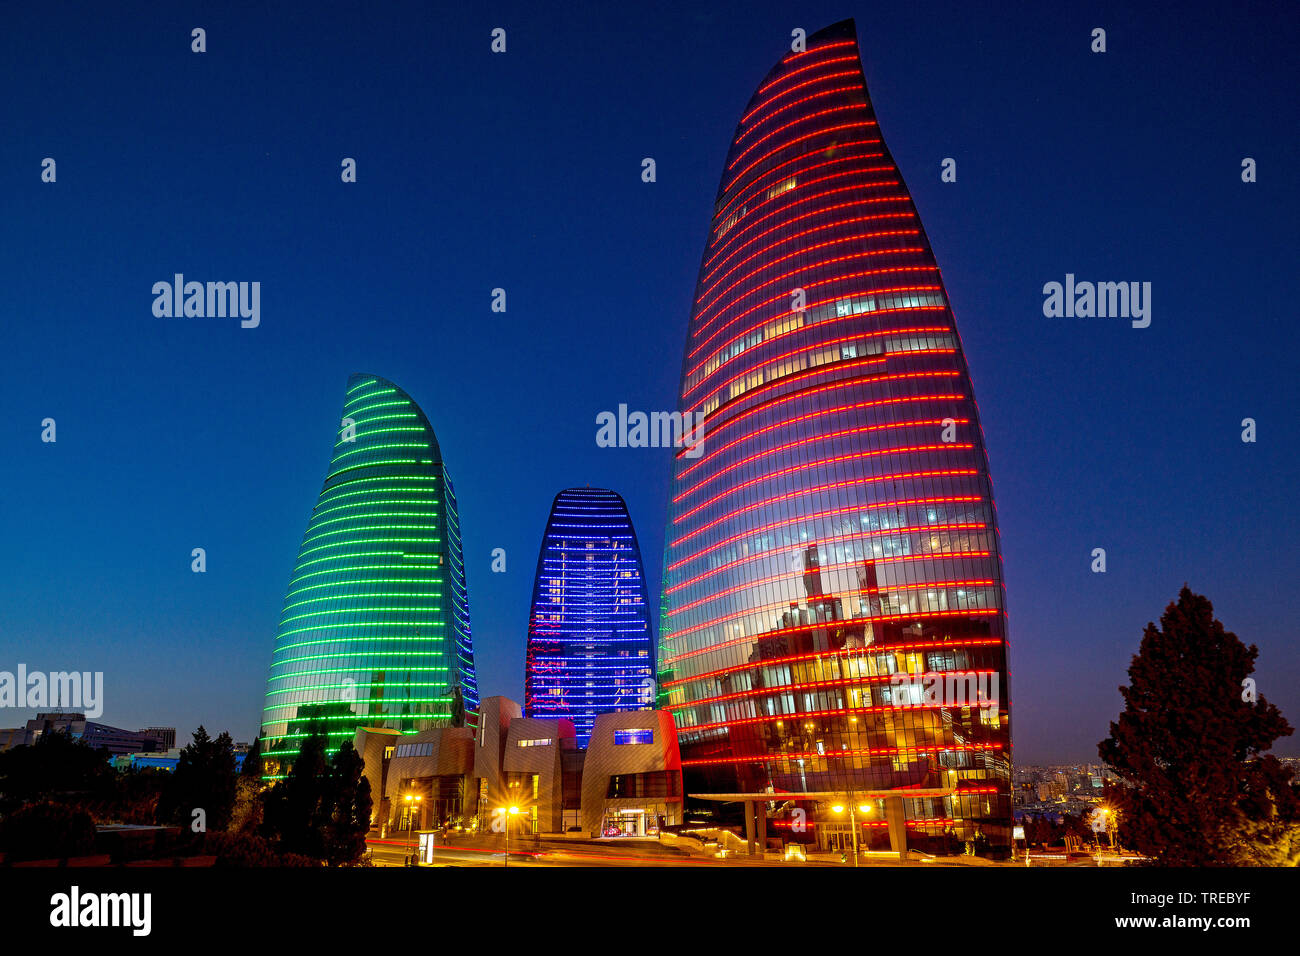 beleuchtete Flame Towers bei Nacht, Aserbaidschan, Baku | illuminated Flame Towers at night, Azerbaijan, Baku | BLWS522476.jpg [ (c) blickwinkel/McPHO - Stock Image